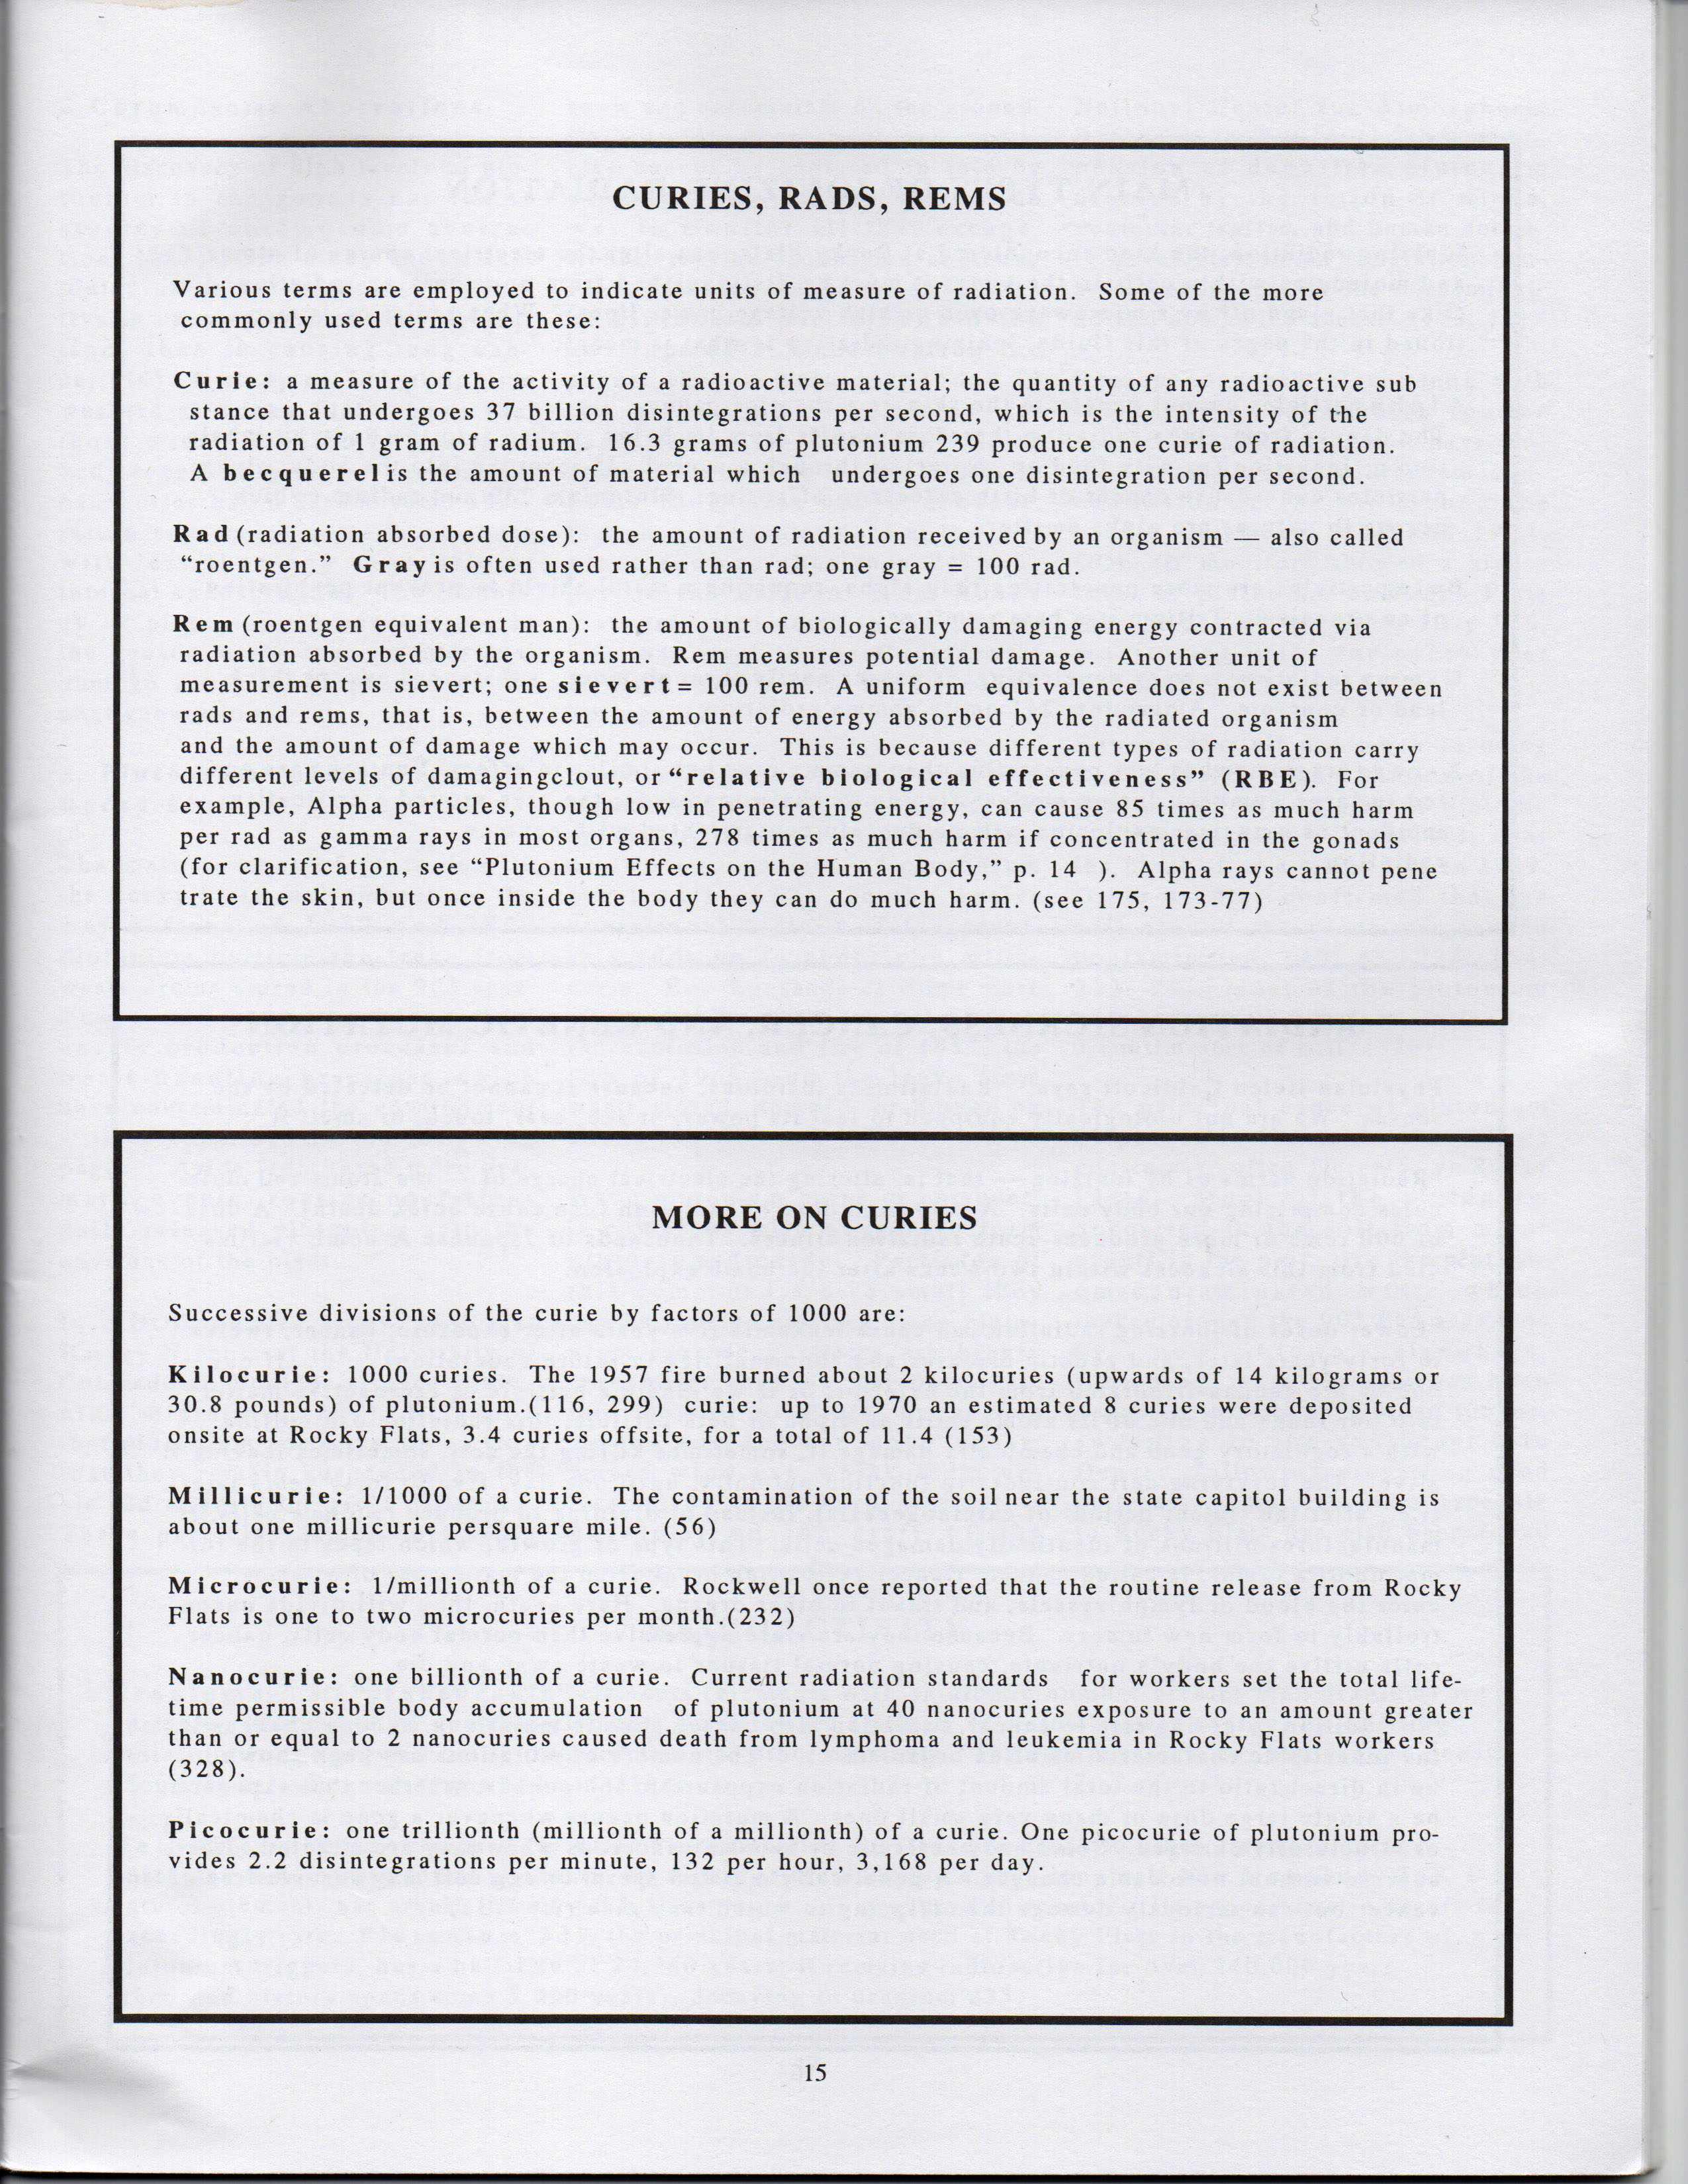 Page 15 Curies Rads Rems.jpg